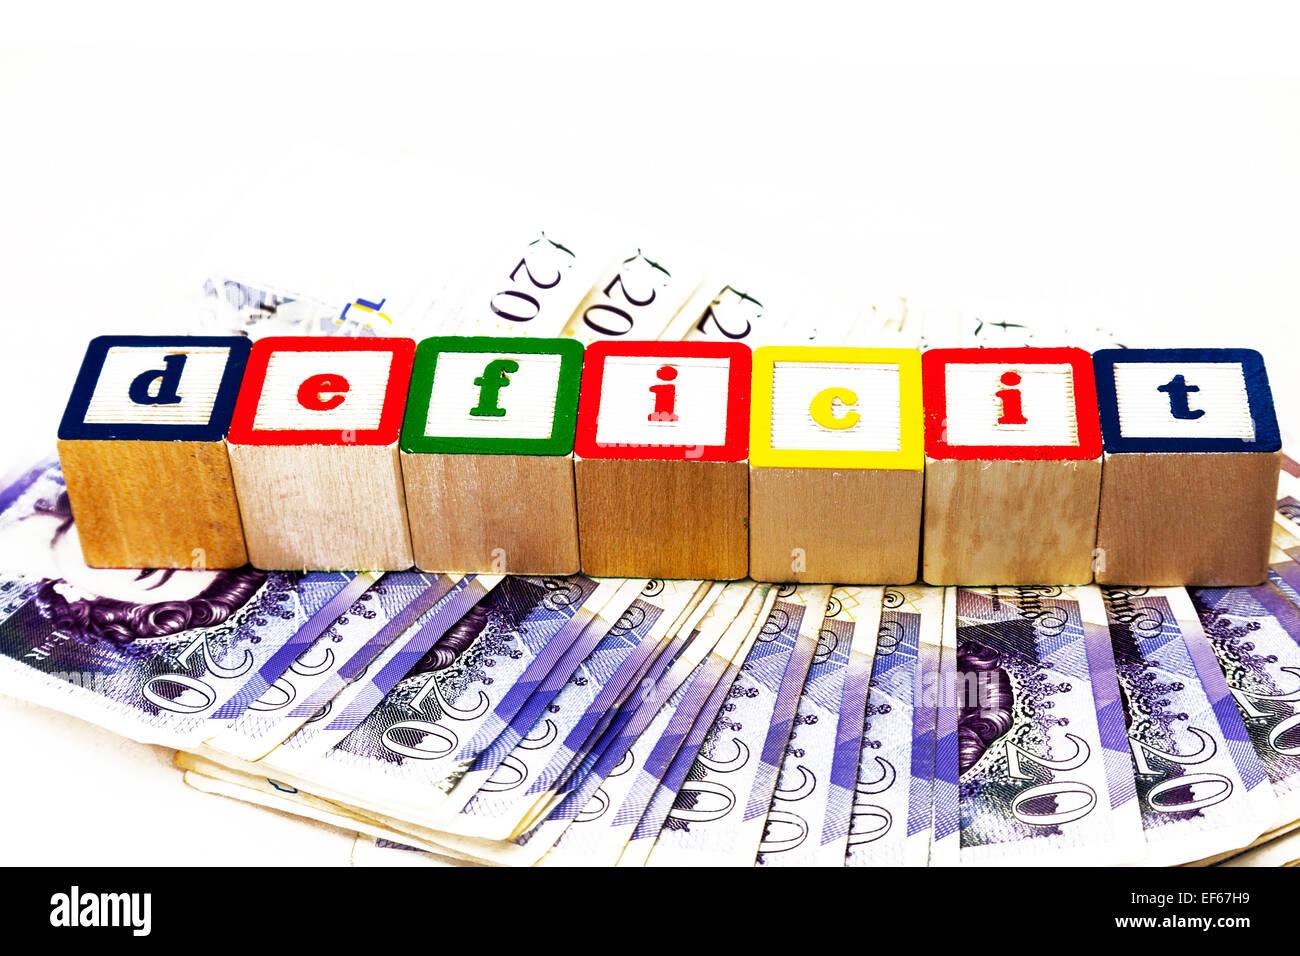 Deficit UK money shortfall owing owe debt debts austerity Copy space cut out white background cash concept word - Stock Image